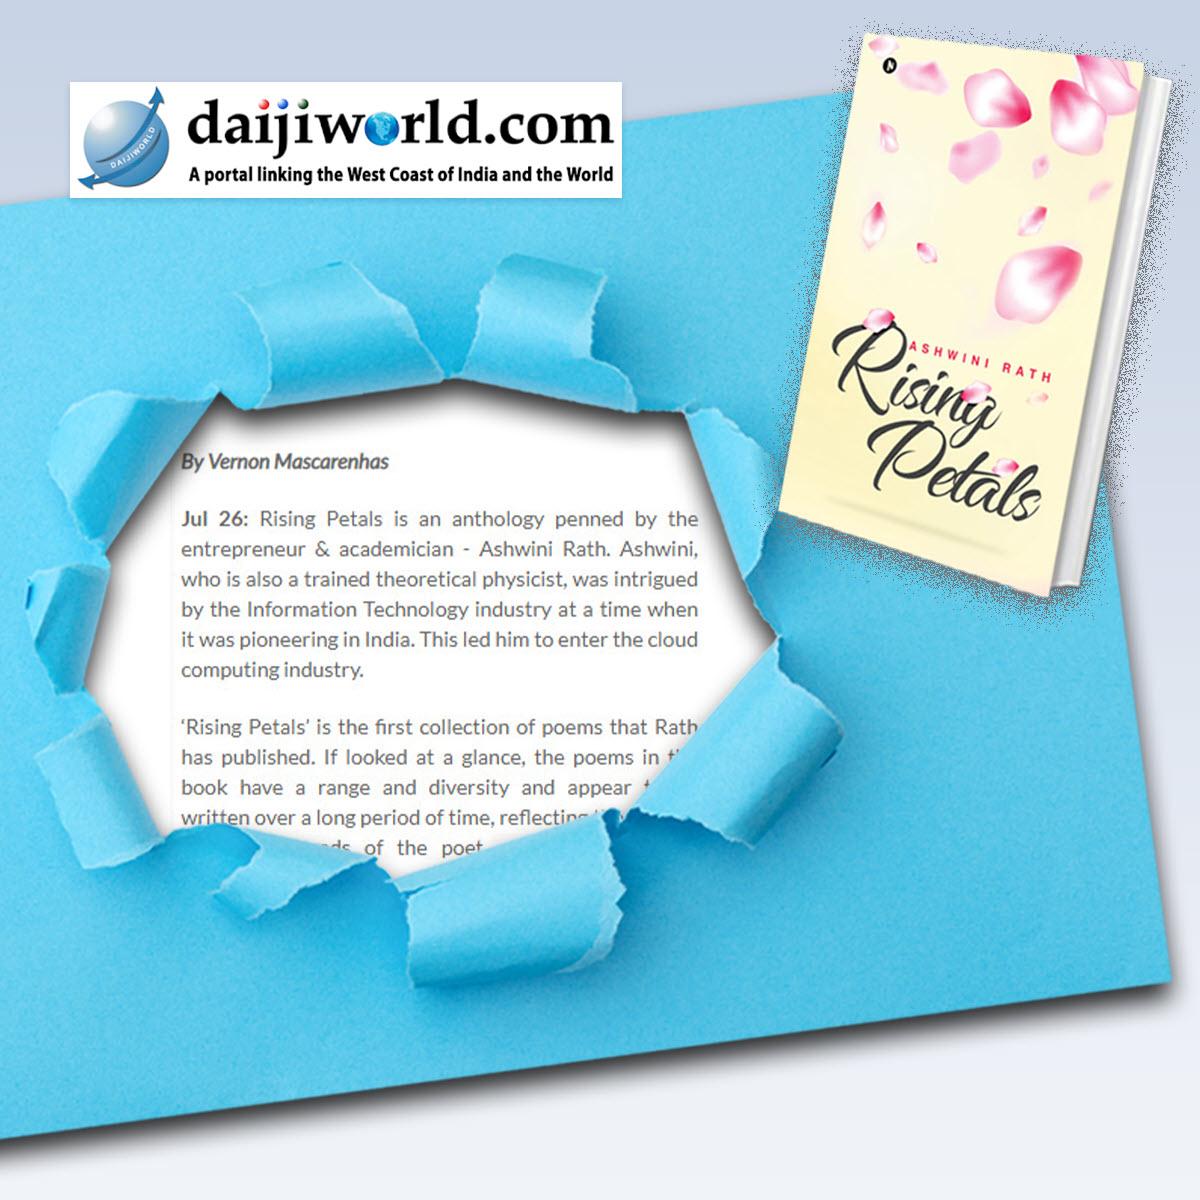 Rising Petals Featured in Daijiworld